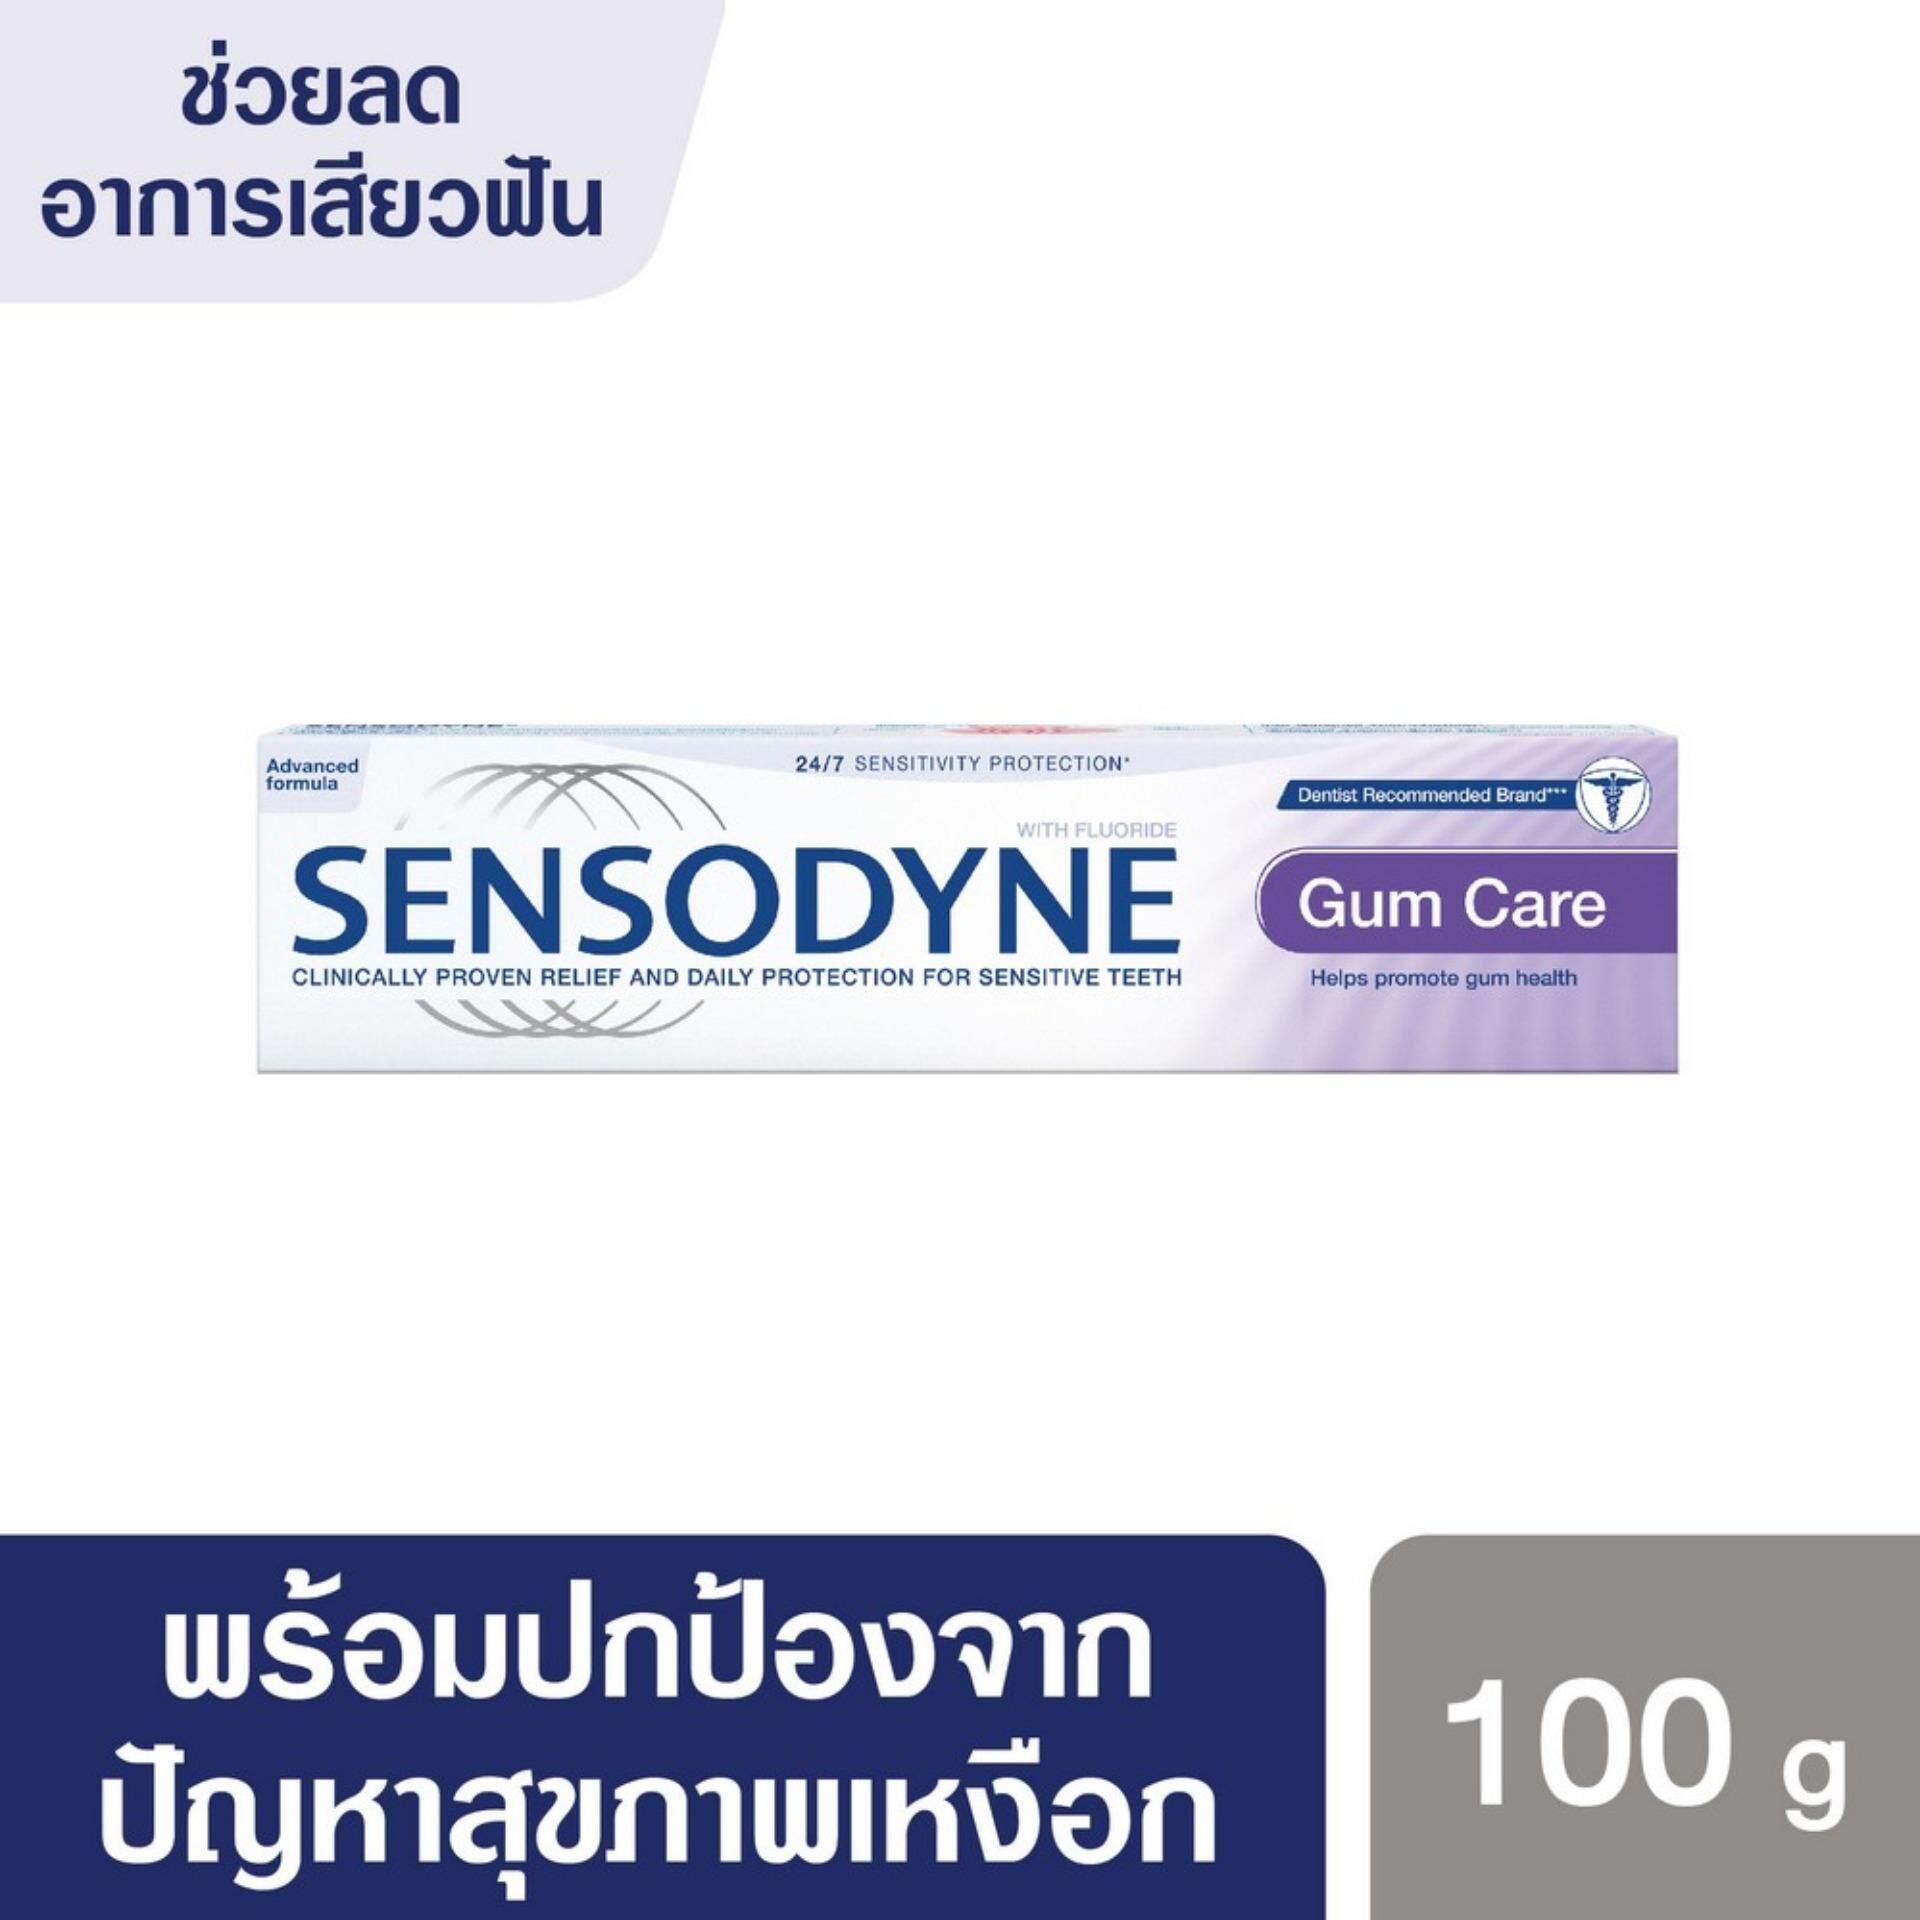 Sensodyne เซ็นโซดายน์ ยาสีฟัน สูตรกัมแคร์ 100 กรัม ช่วยลดอาการเสียวฟัน ช่วยลดการสะสมของคราบพลัคเพื่อเหงือกที่มีสุขภาพดี Sensodyne Gum Care Toothpaste 100 g reduce tooth sensitivity reduce the plaque accumulation for good gum health